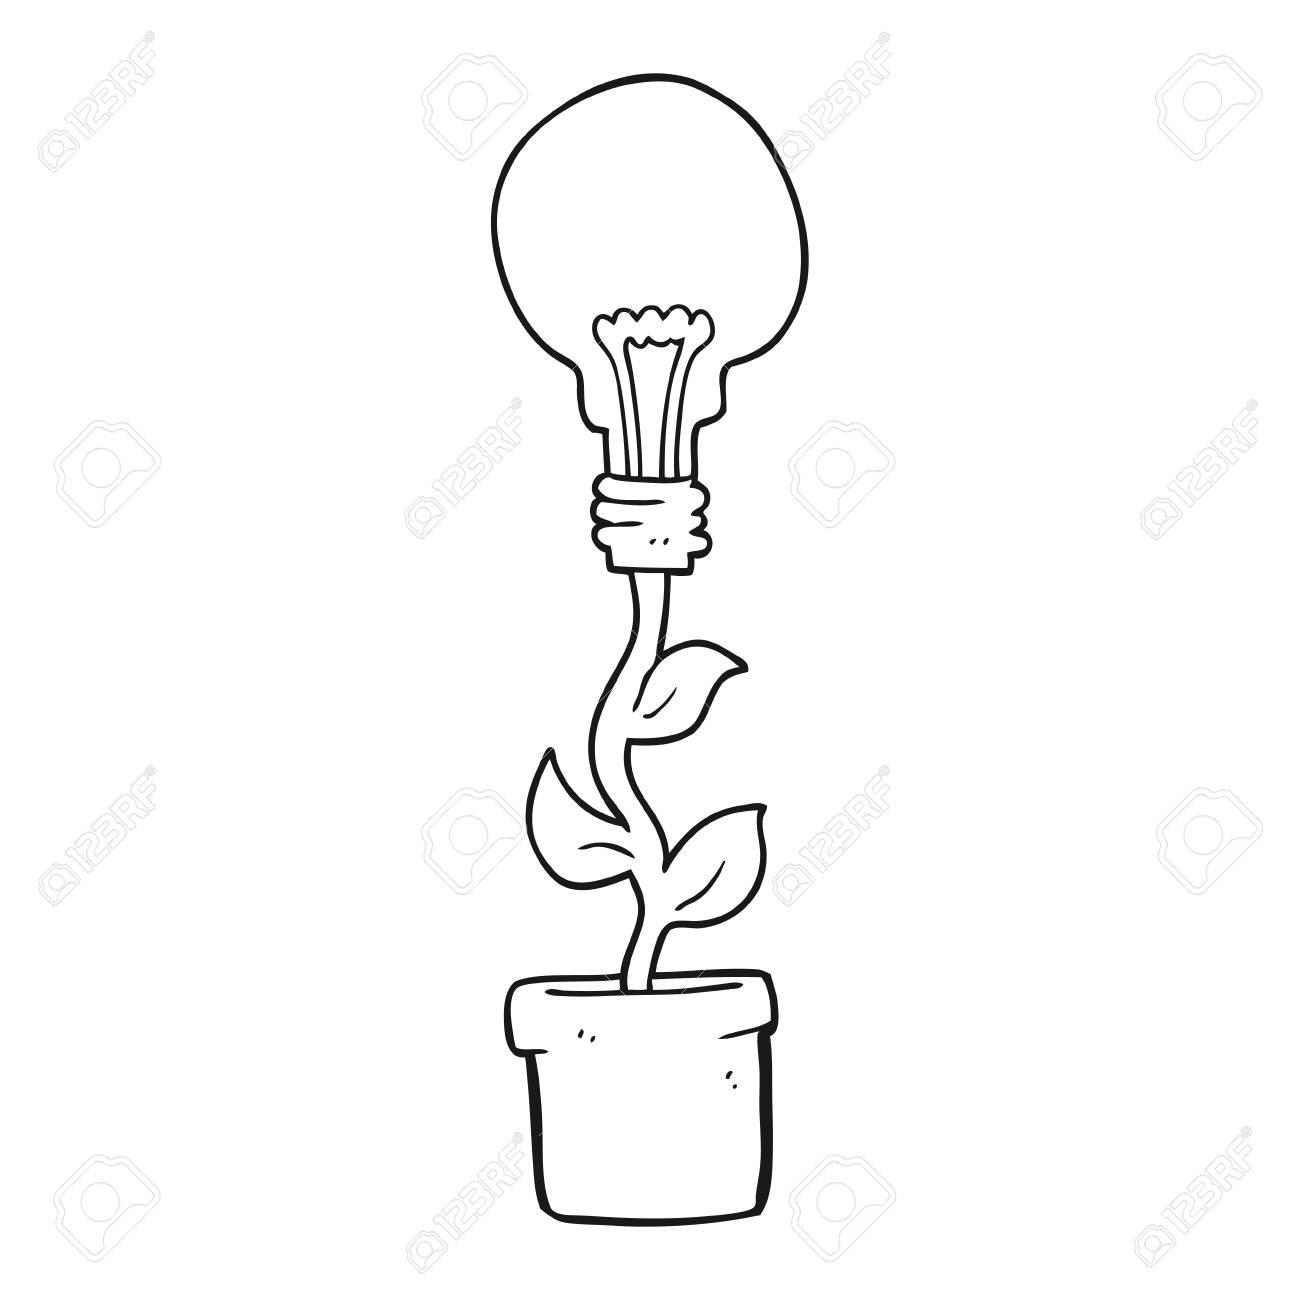 Freehand Drawn Black And White Cartoon Light Bulb Plant Royalty Free